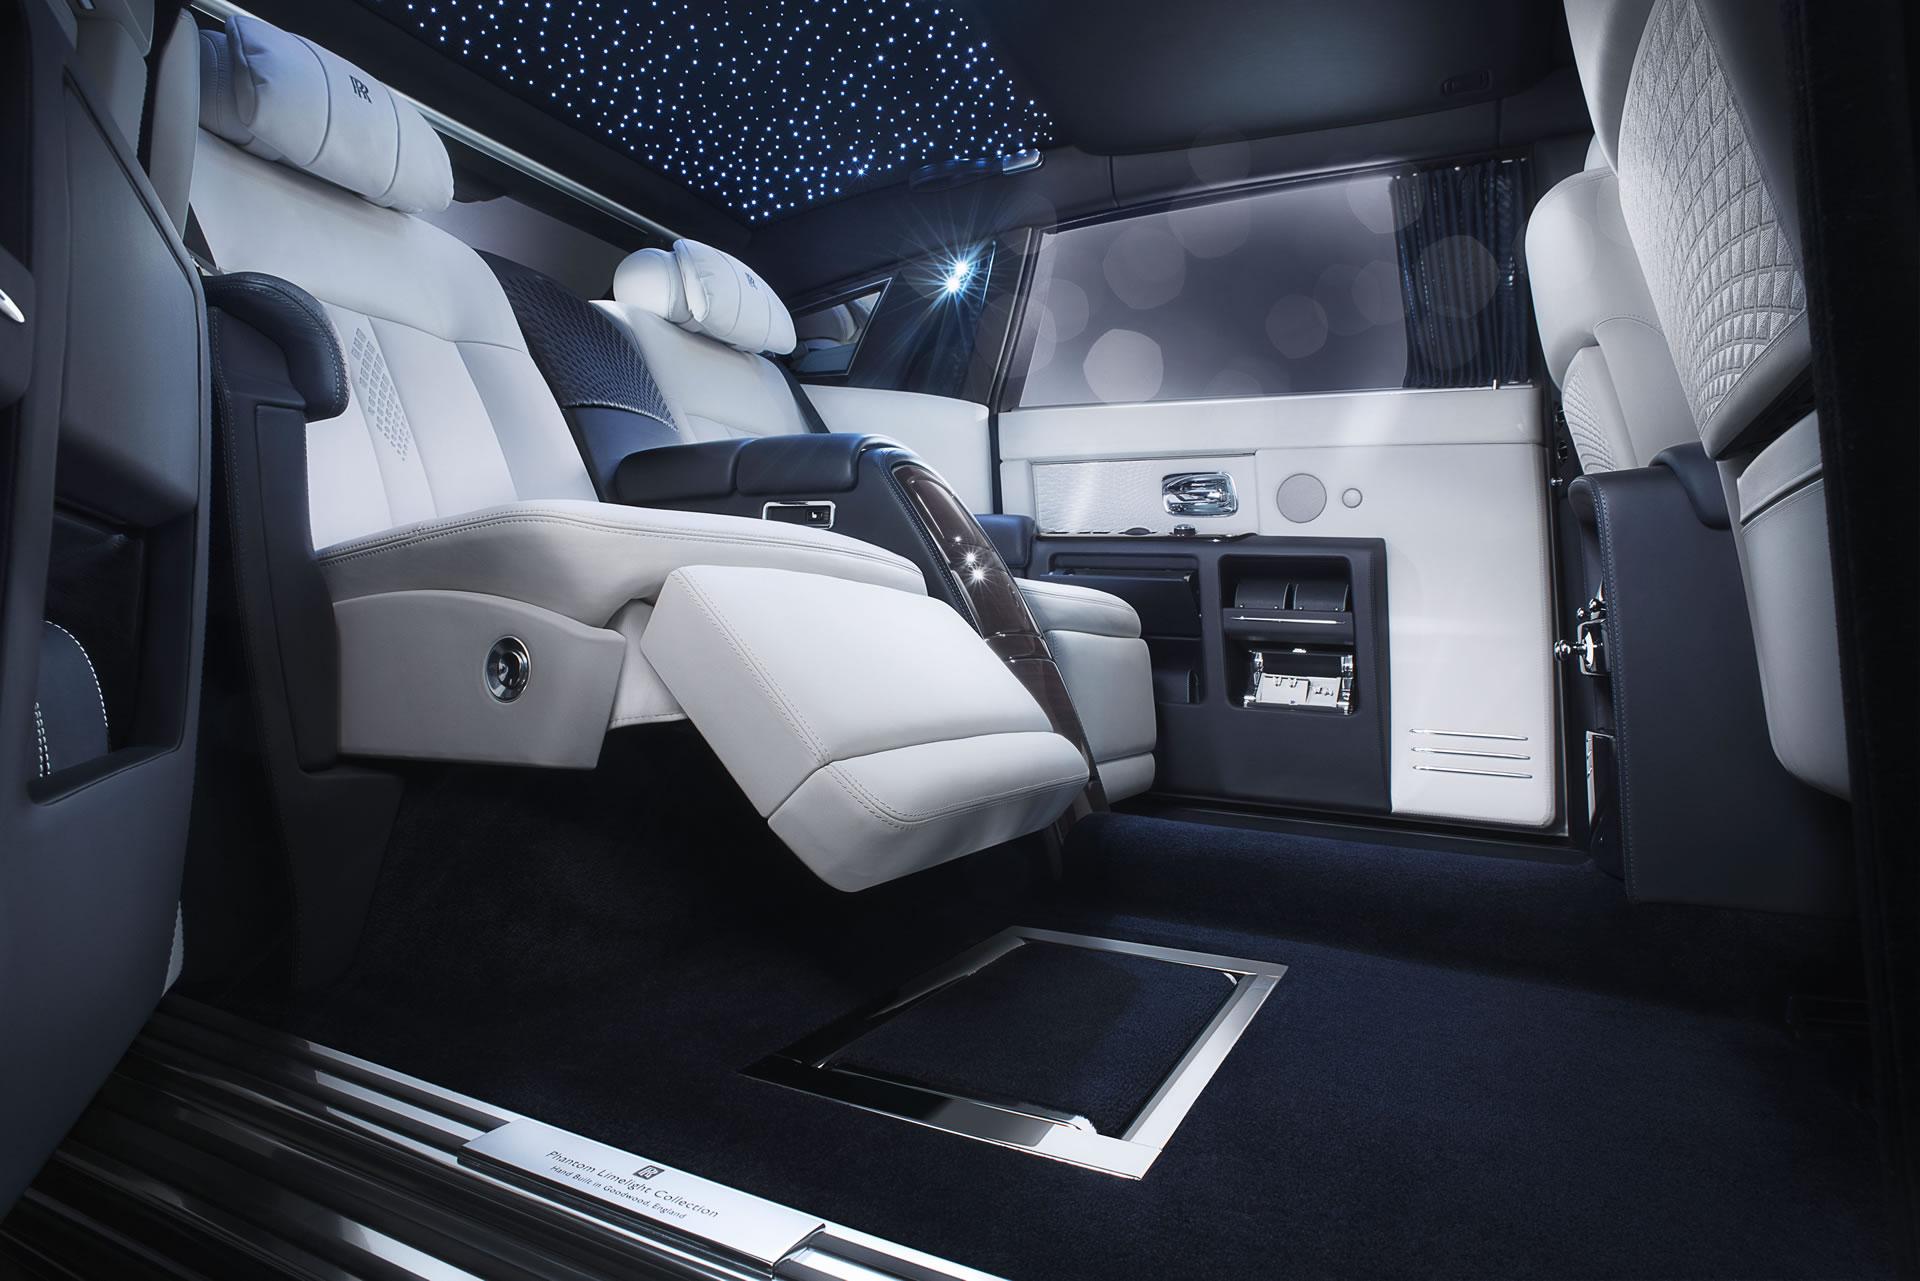 2015 Rolls Royce Phantom Limelight Wallpaper: Rolls-Royce Phantom Limelight Collection